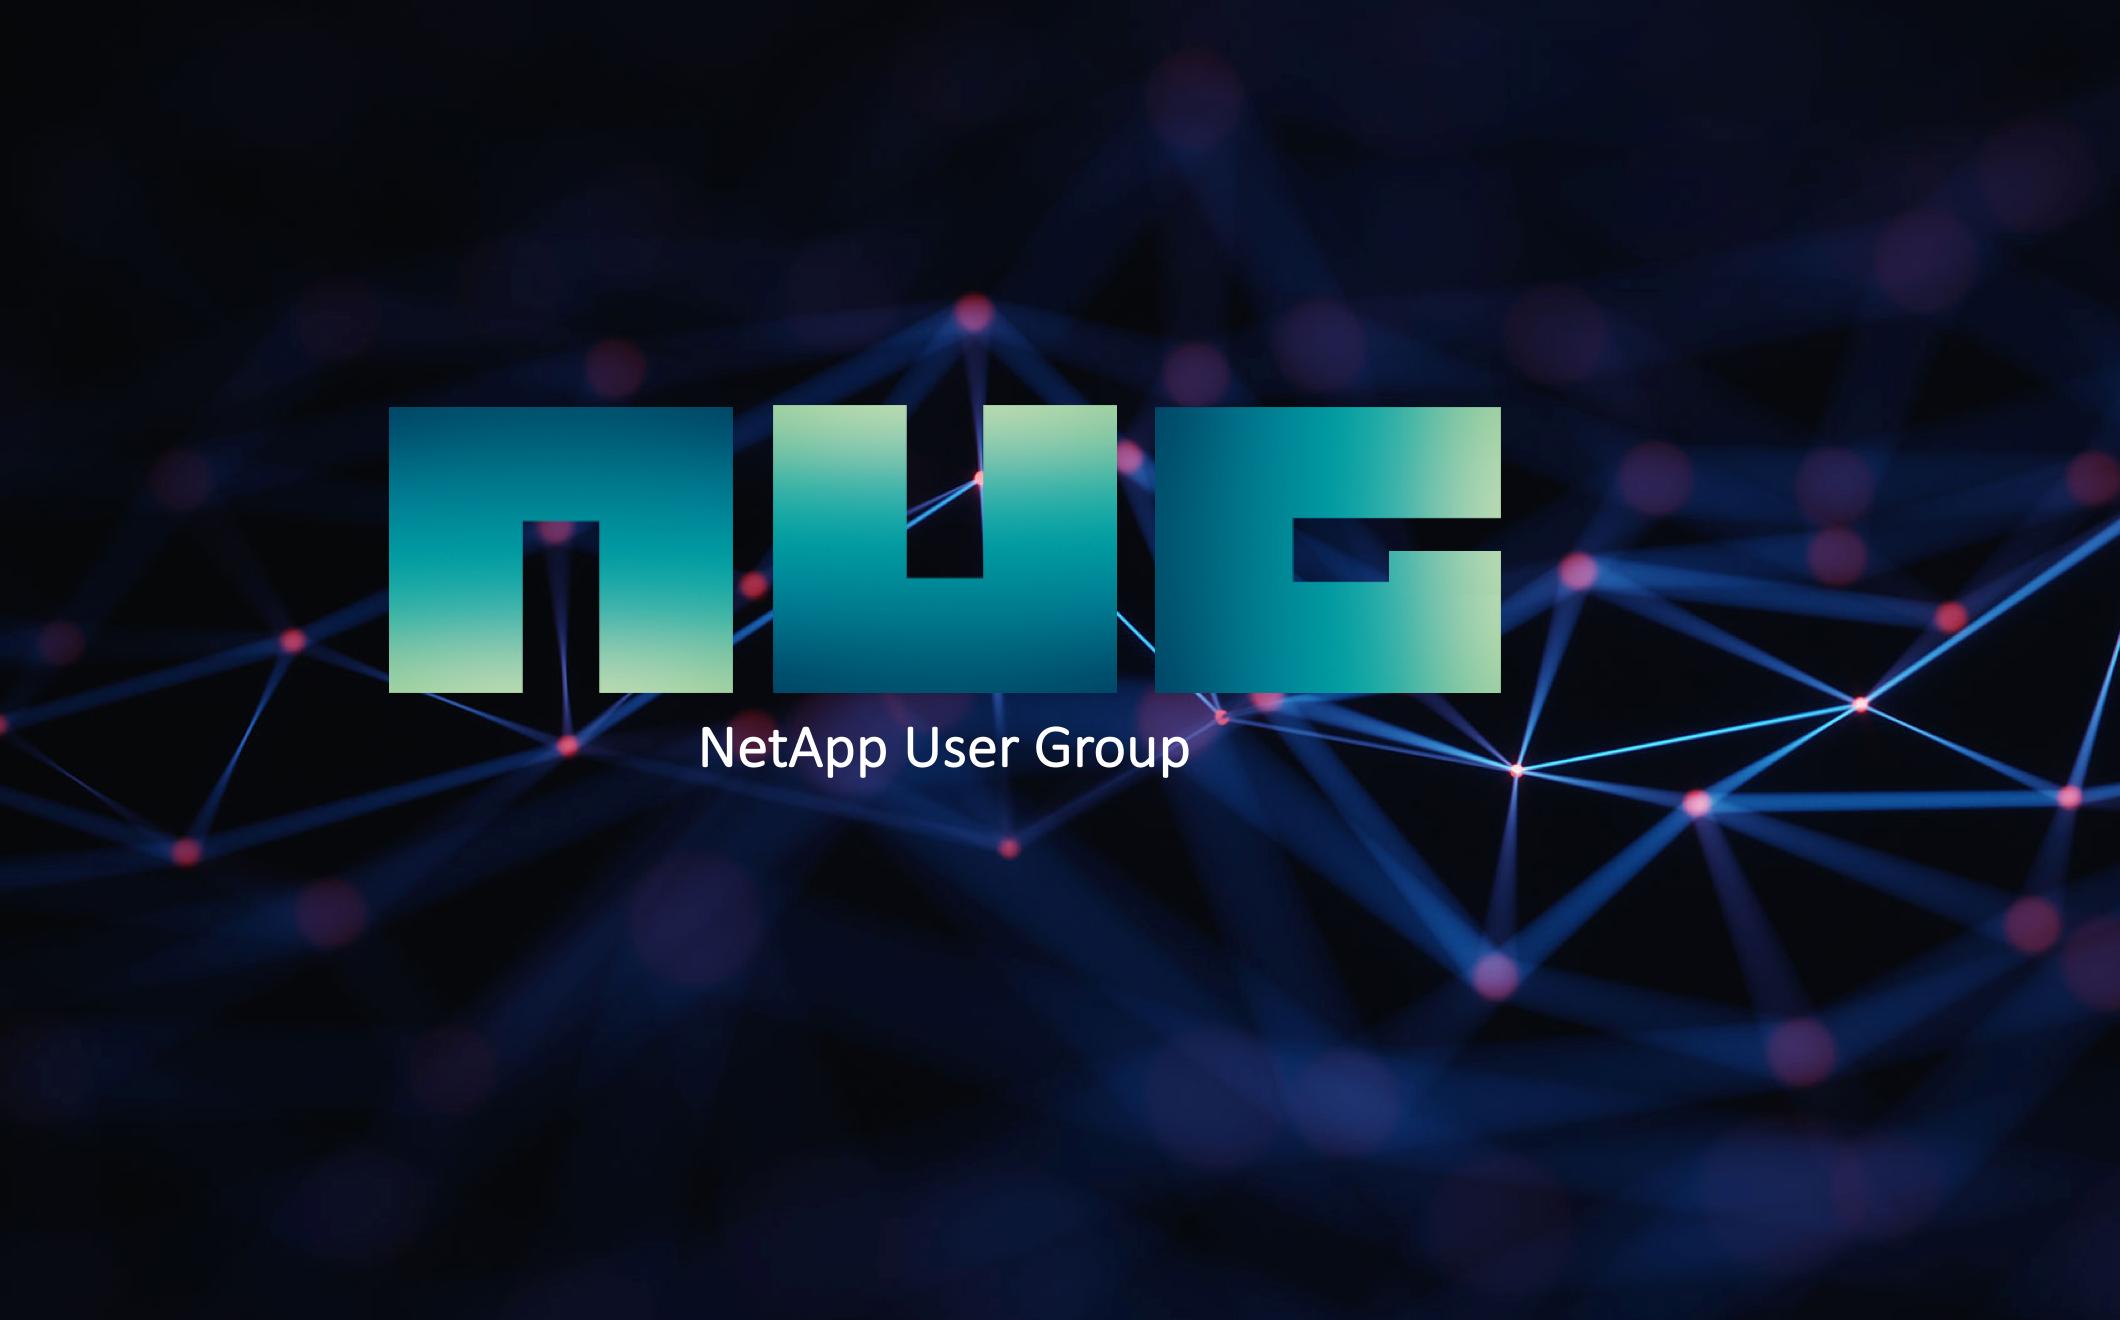 NZ NetApp User Group